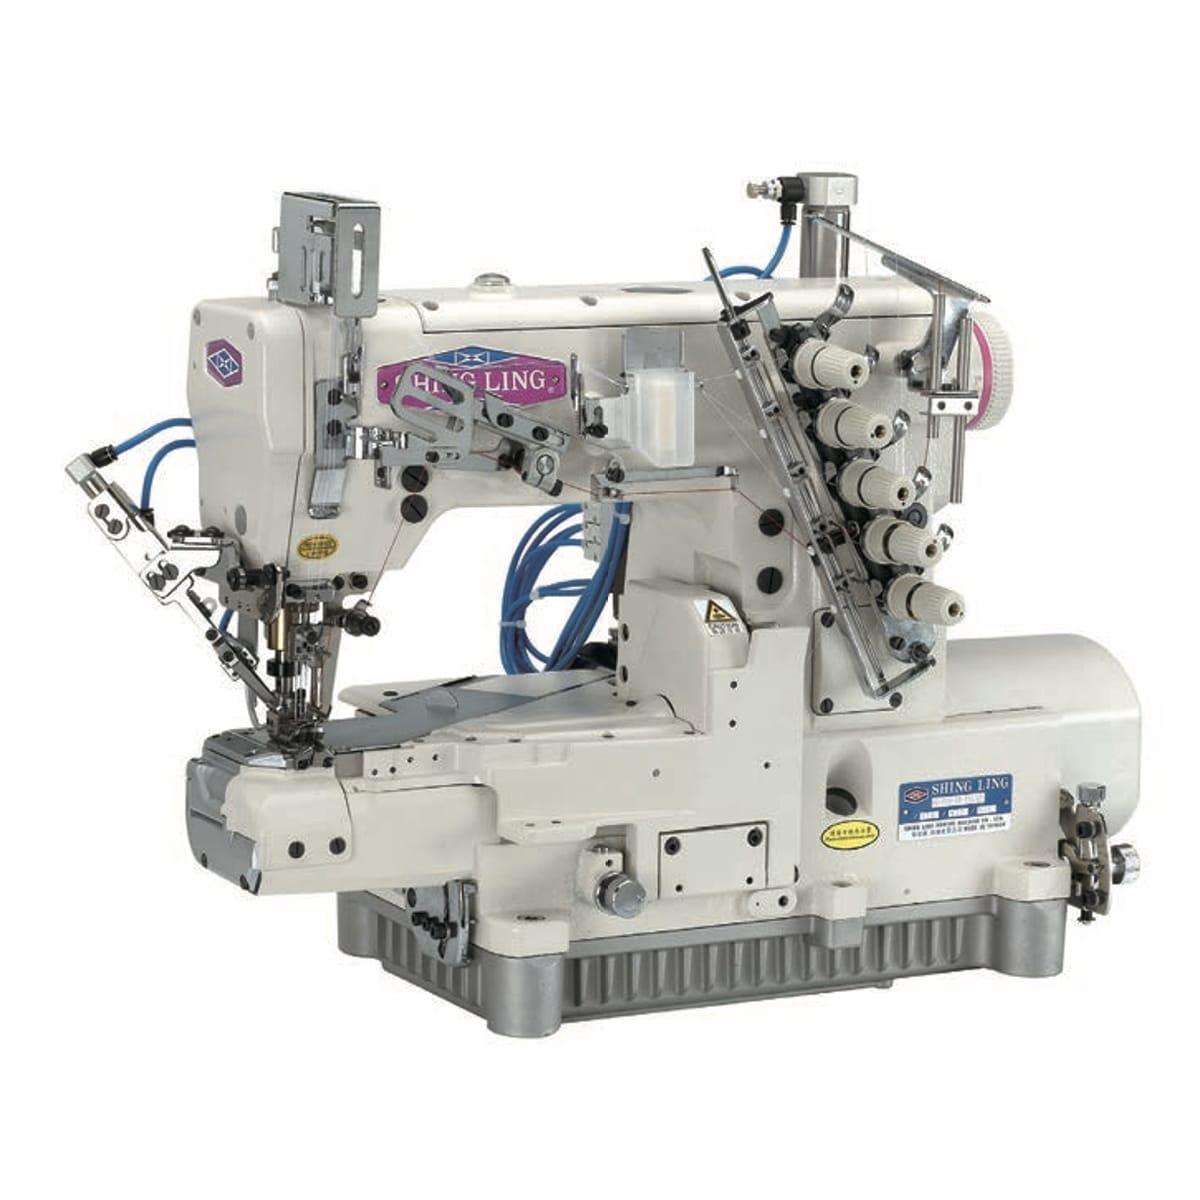 VG-999 Series 高速橫筒型三針五線雙面飾綳縫機